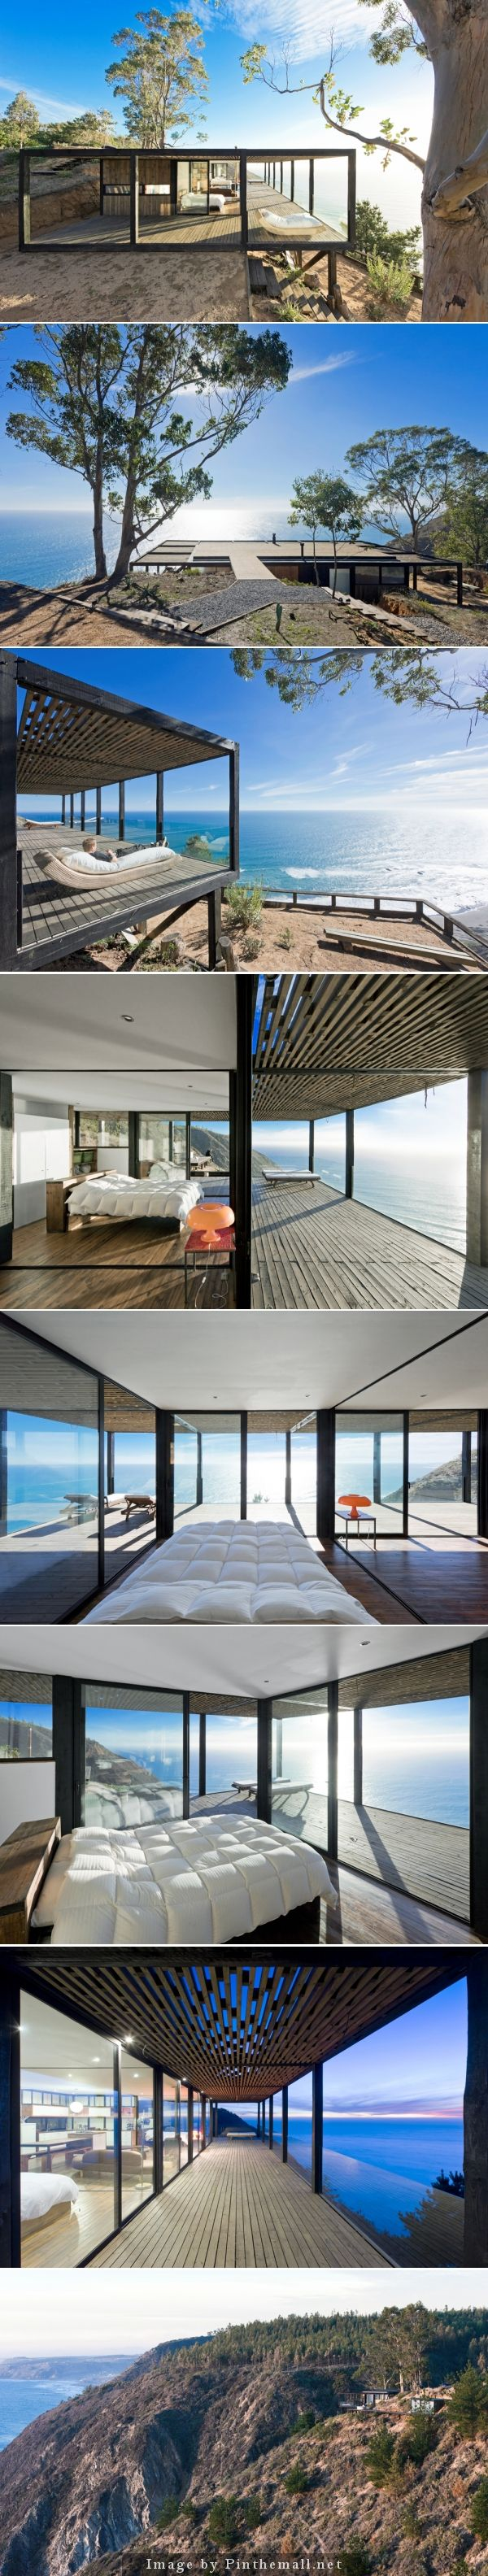 Casa Till, a new private home by WMR Arquitectos.   http://www.knstrct.com/architecture-blog/2014/4/13/casa-till-by-wmr-arquitectos - created via http://pinthemall.net